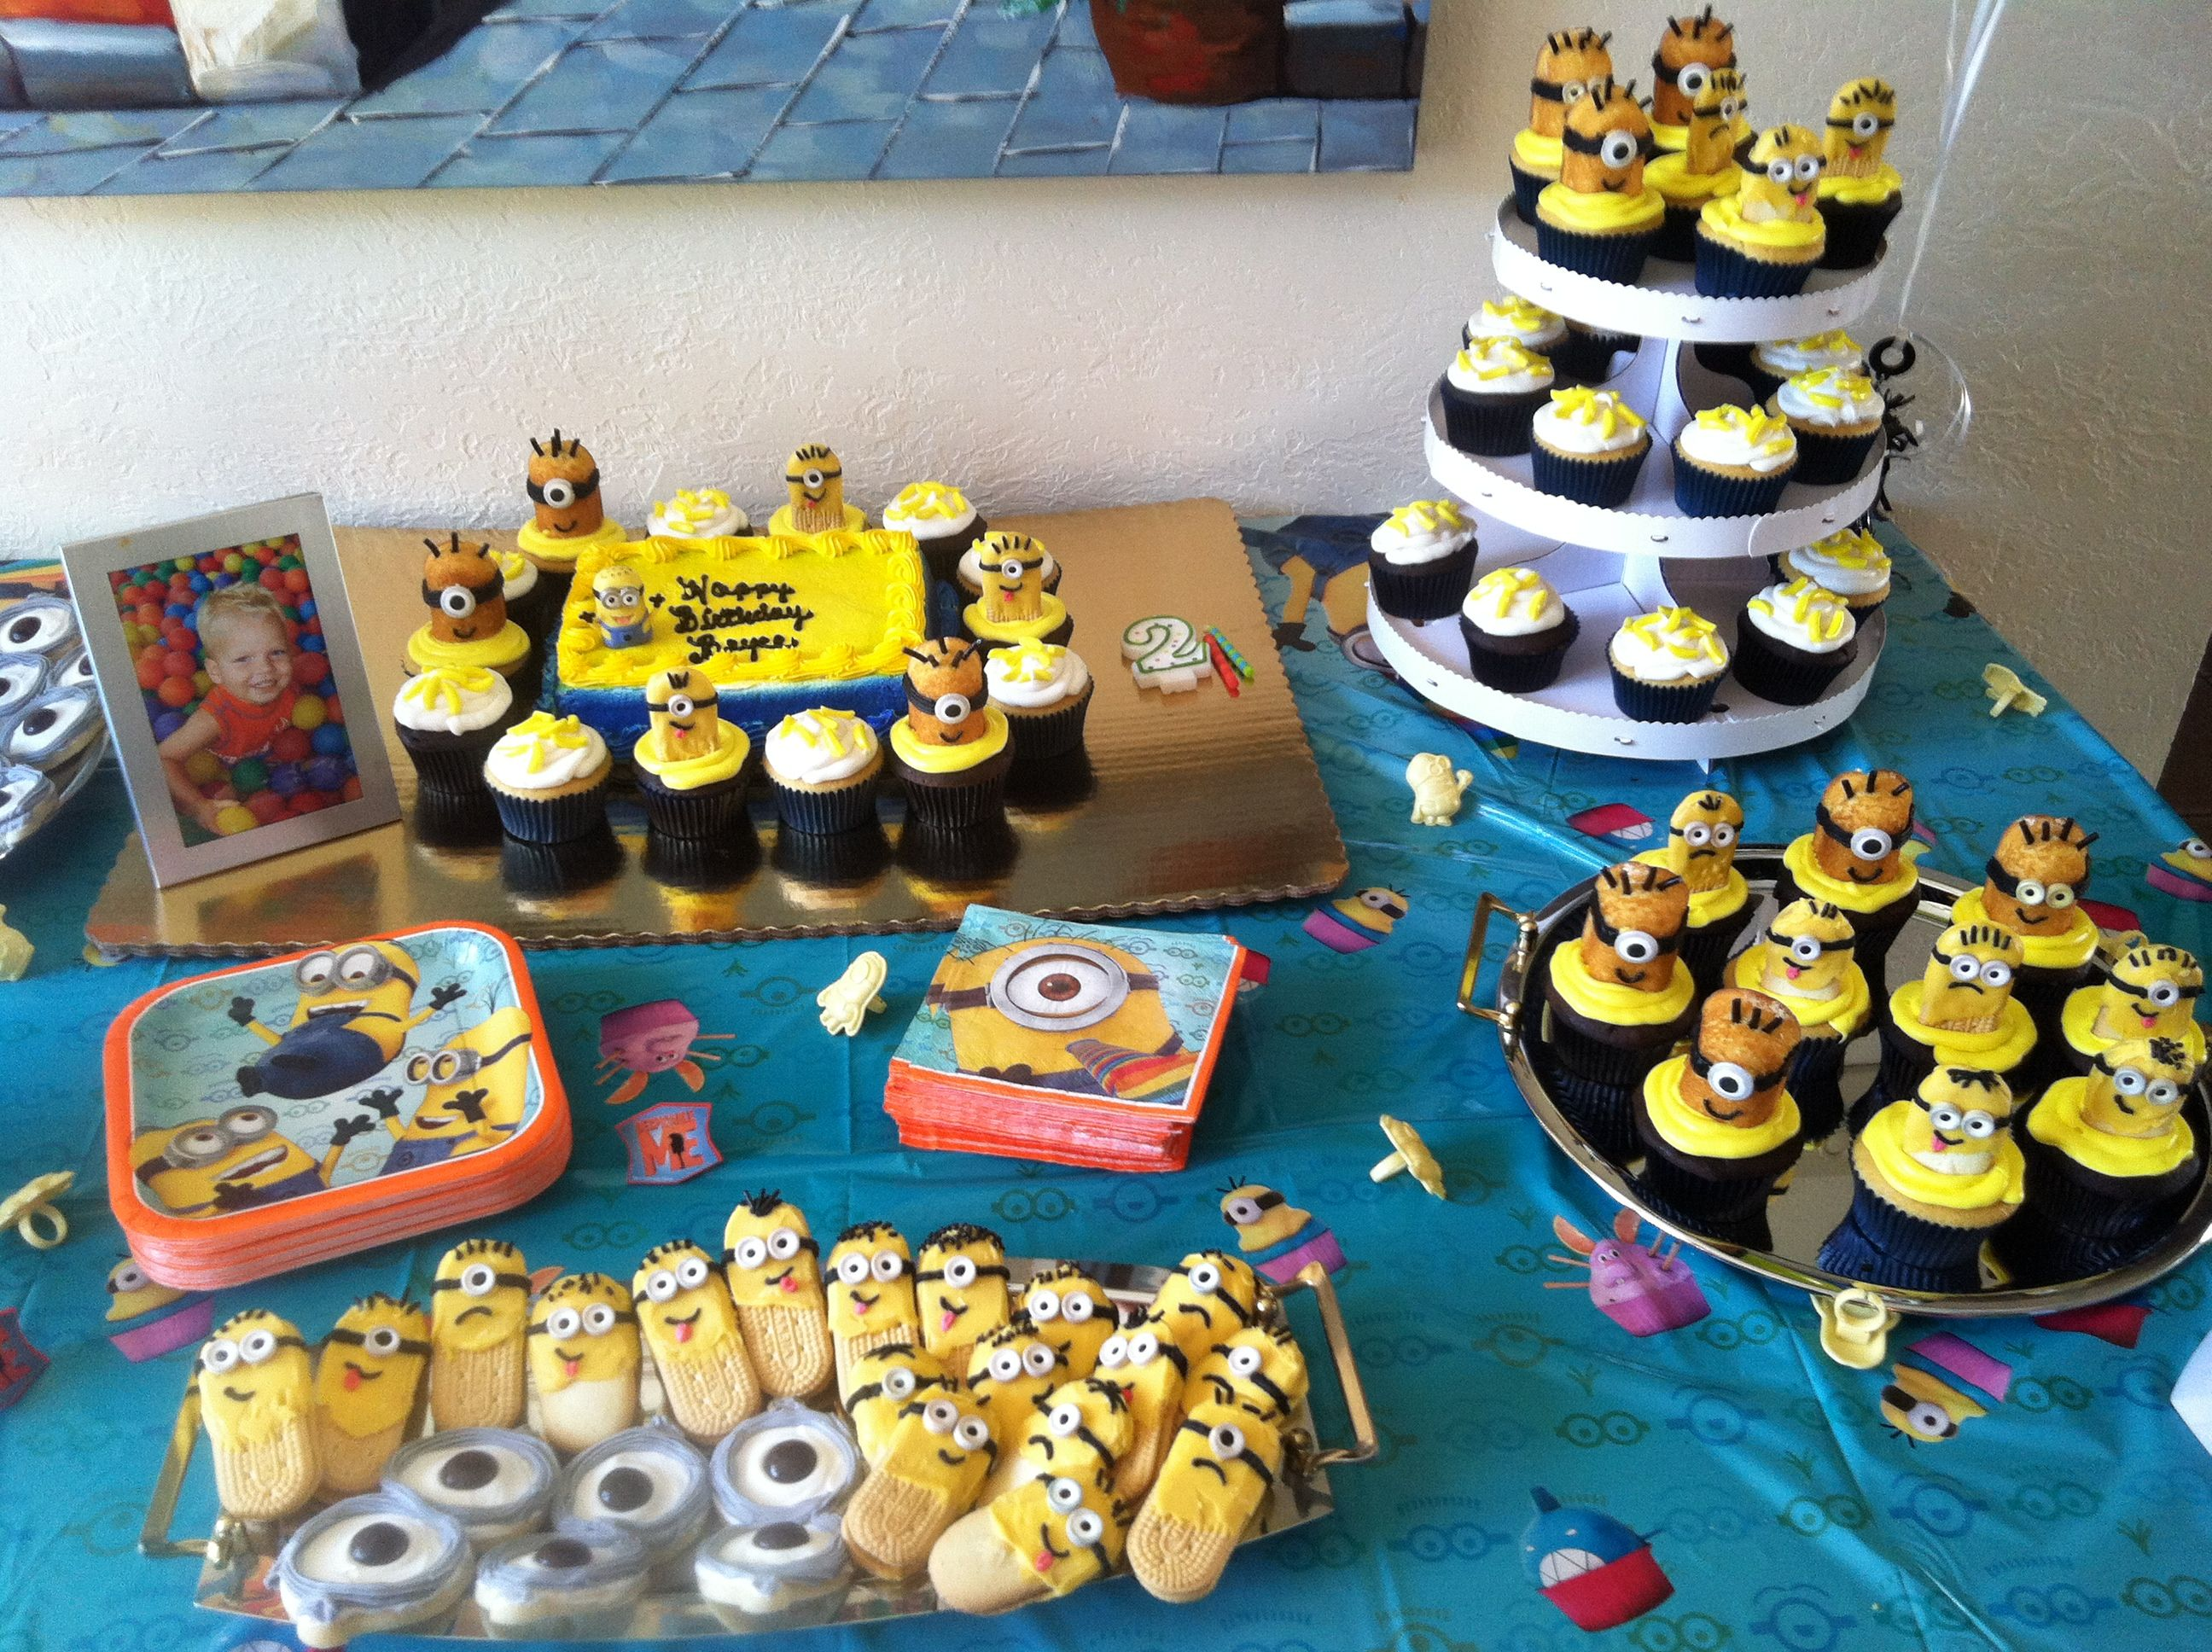 Minion birthday bash My 2 year old loved his theme Birthday